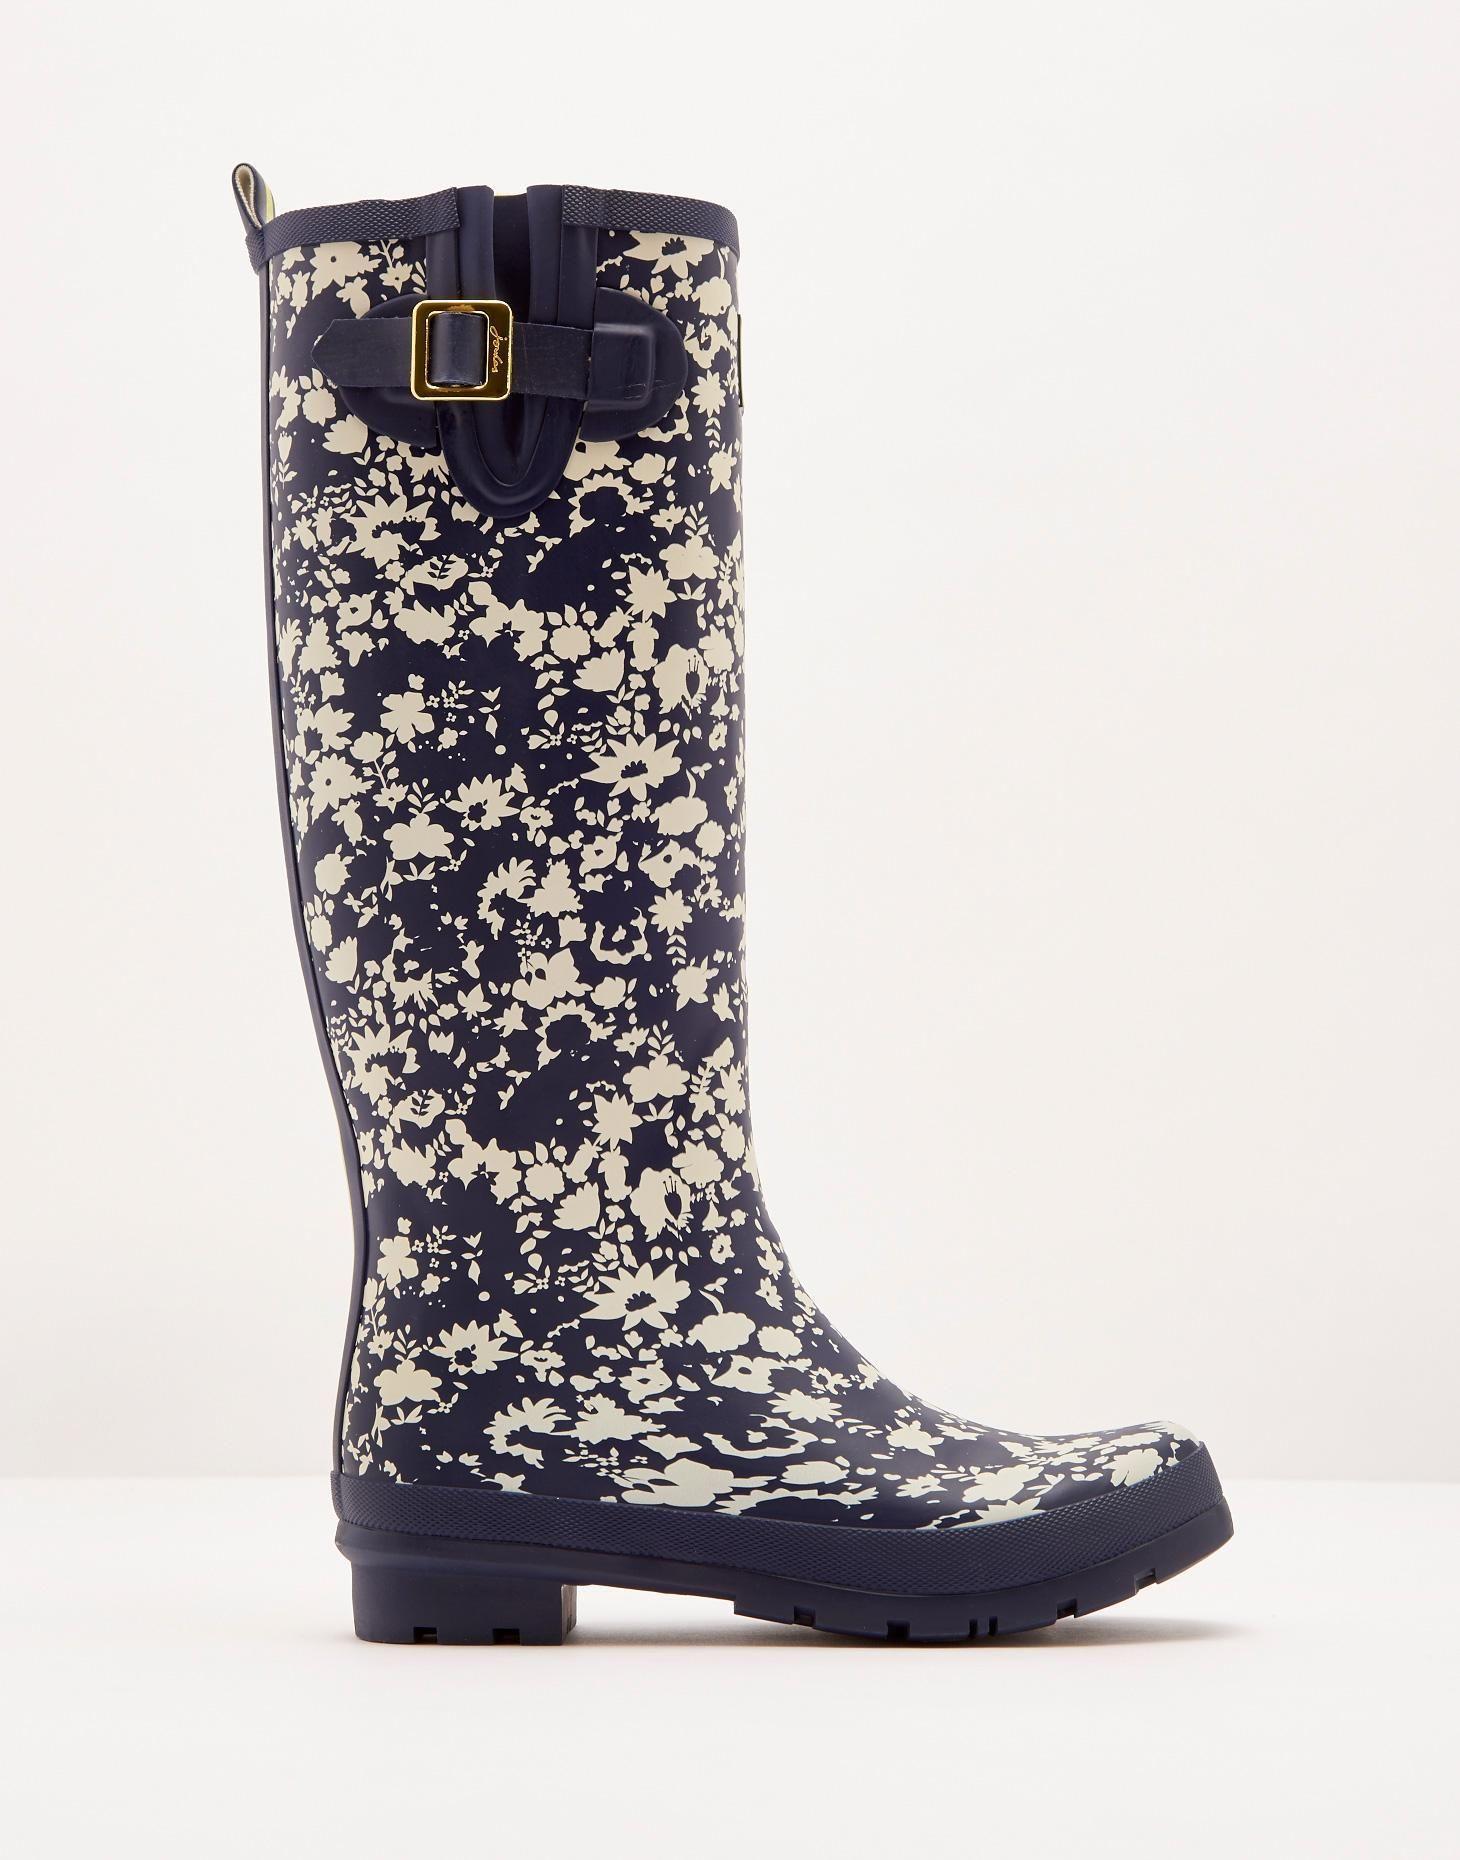 4aff67e7e58 Printed Navy Ditsy Printed Rain Boot Wellies